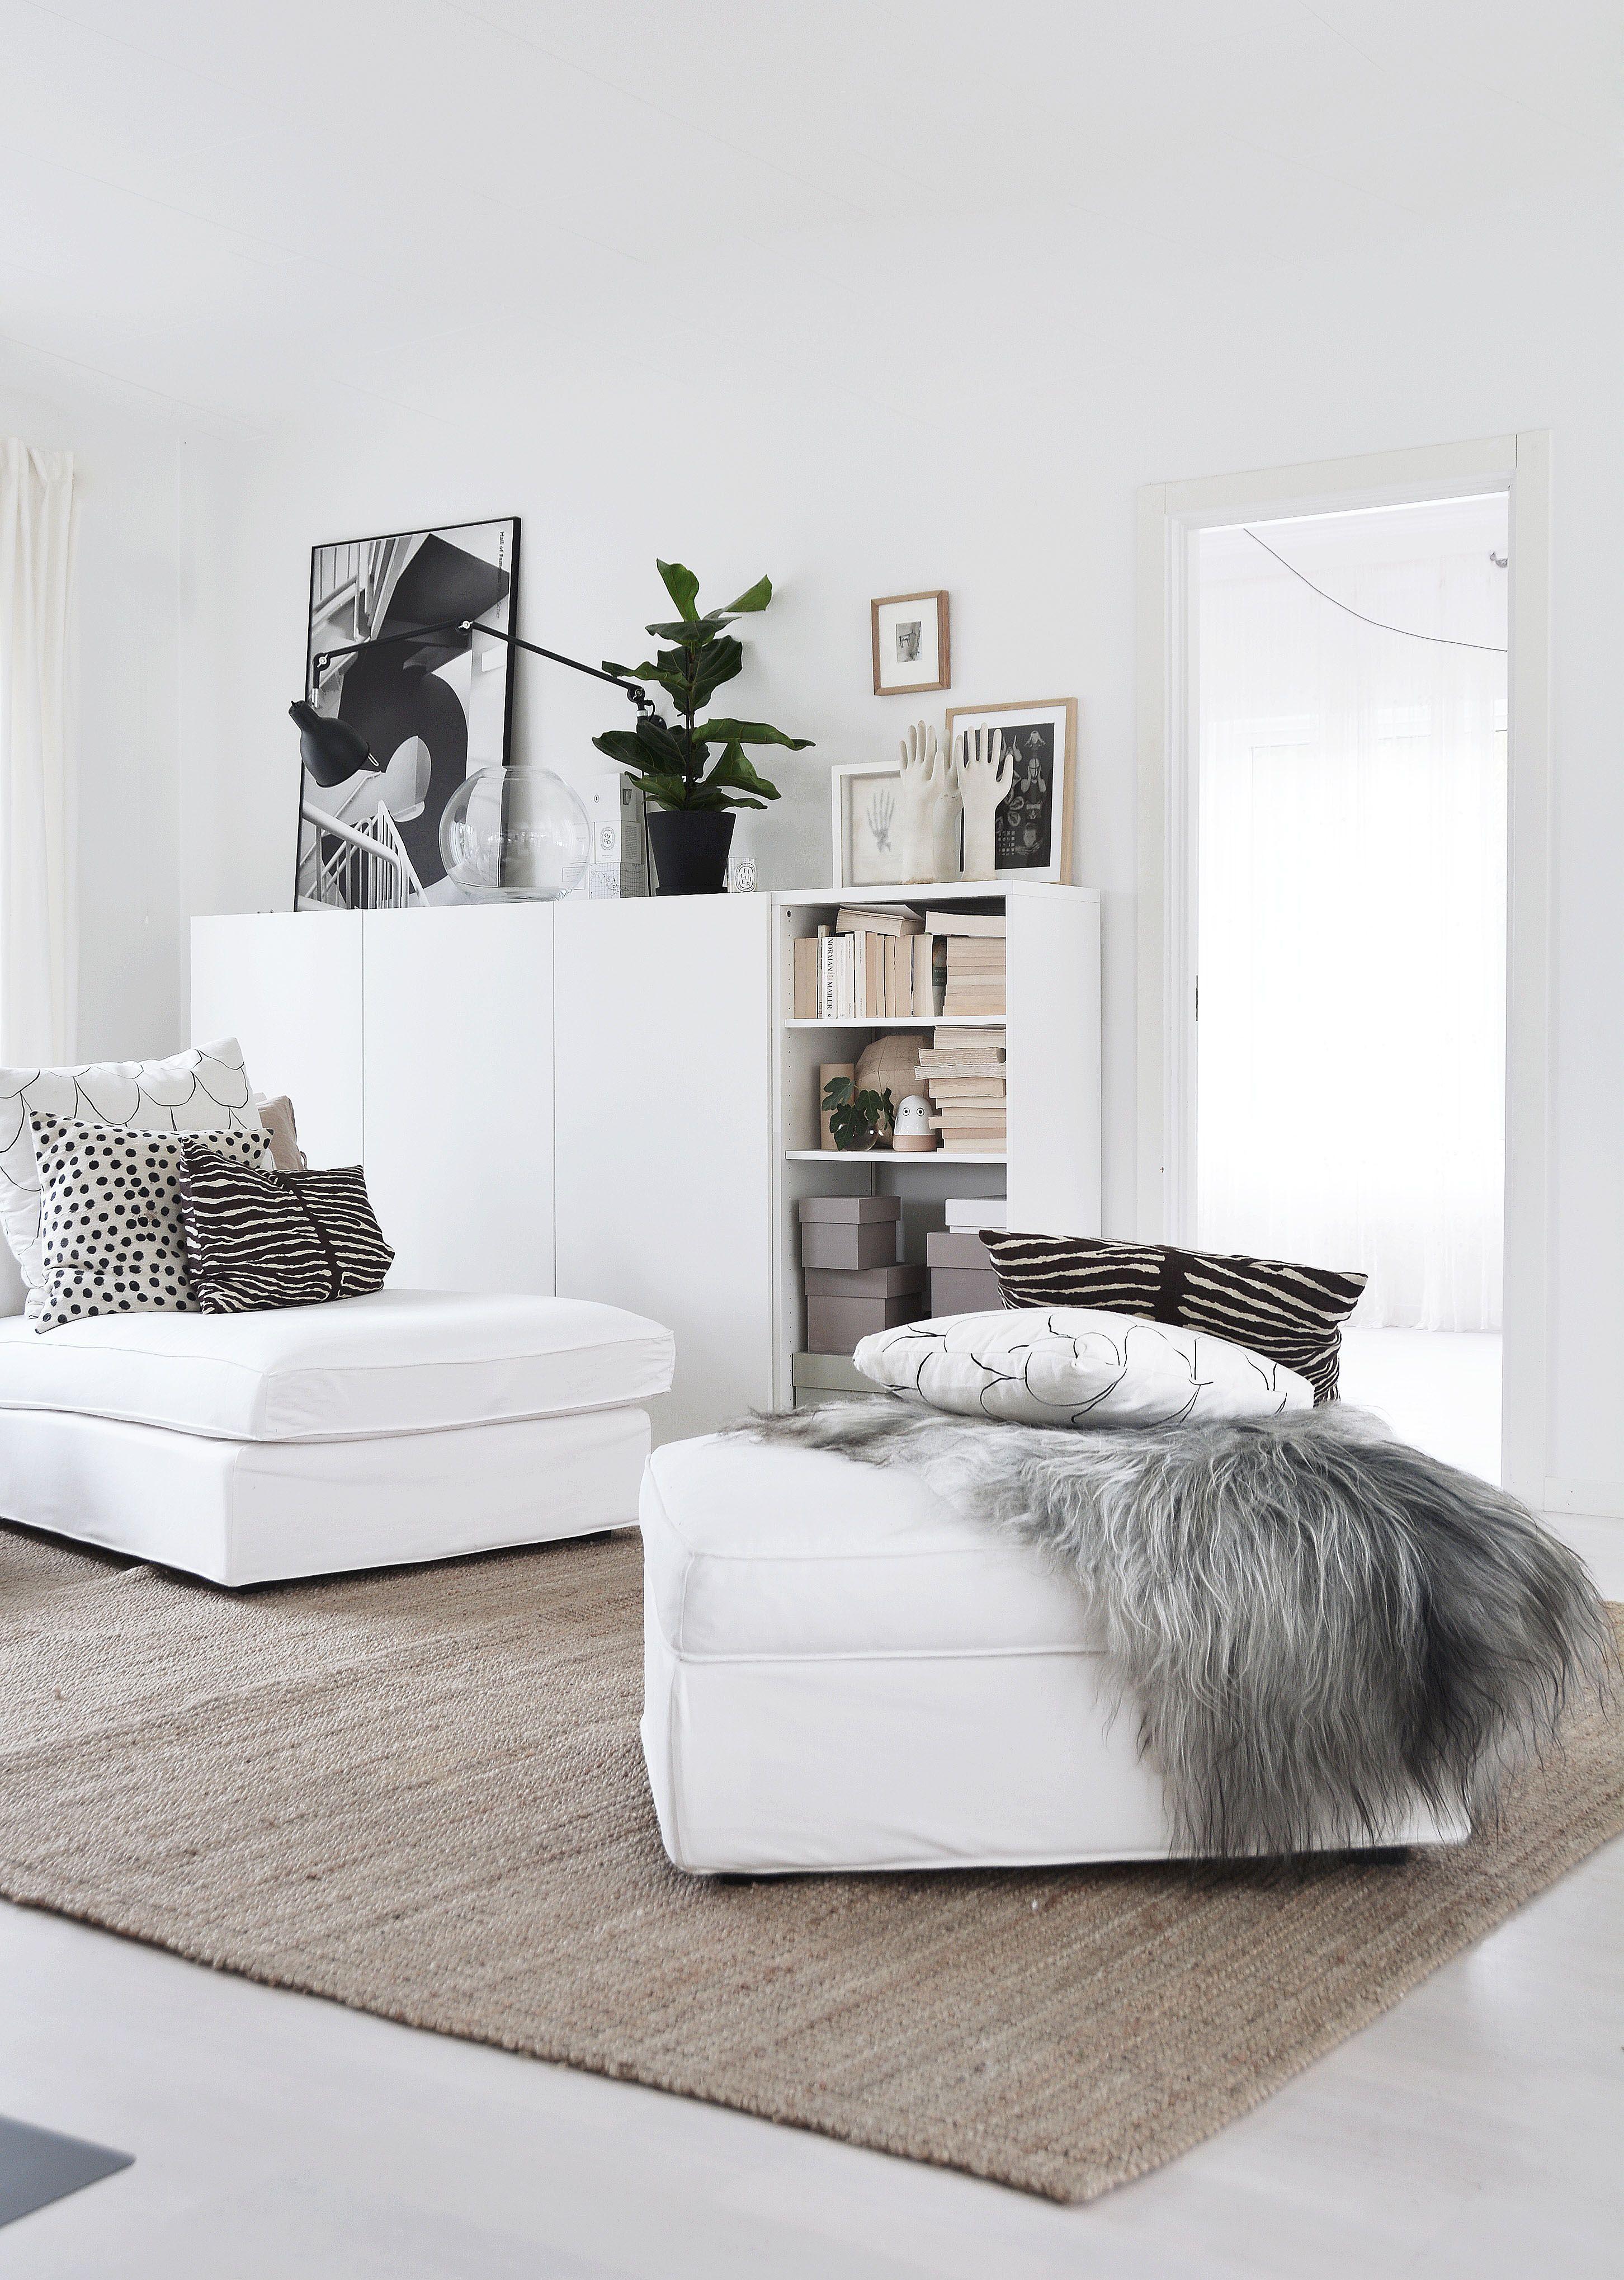 neutral rug + white sofa + white cabinetry